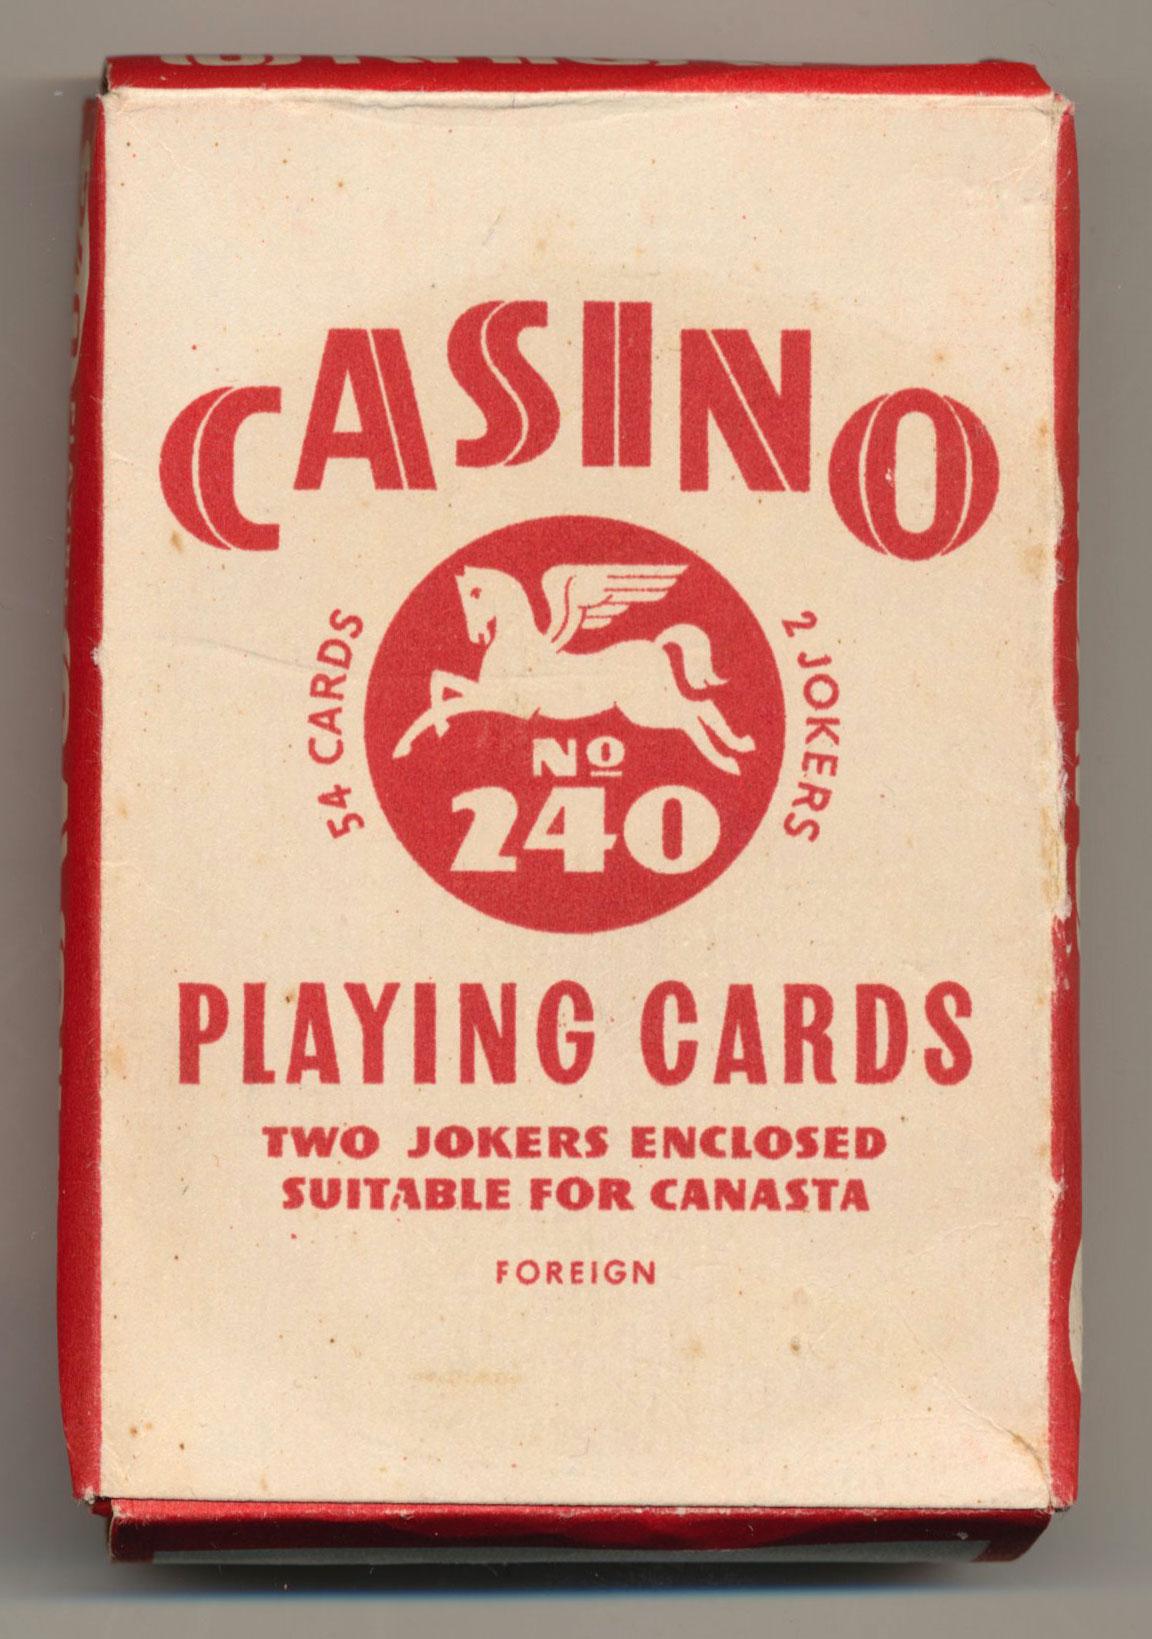 No.240 'Casino' playing cards manufactured by Obchodní Tiskárny, 1955, in importation duty wrapper